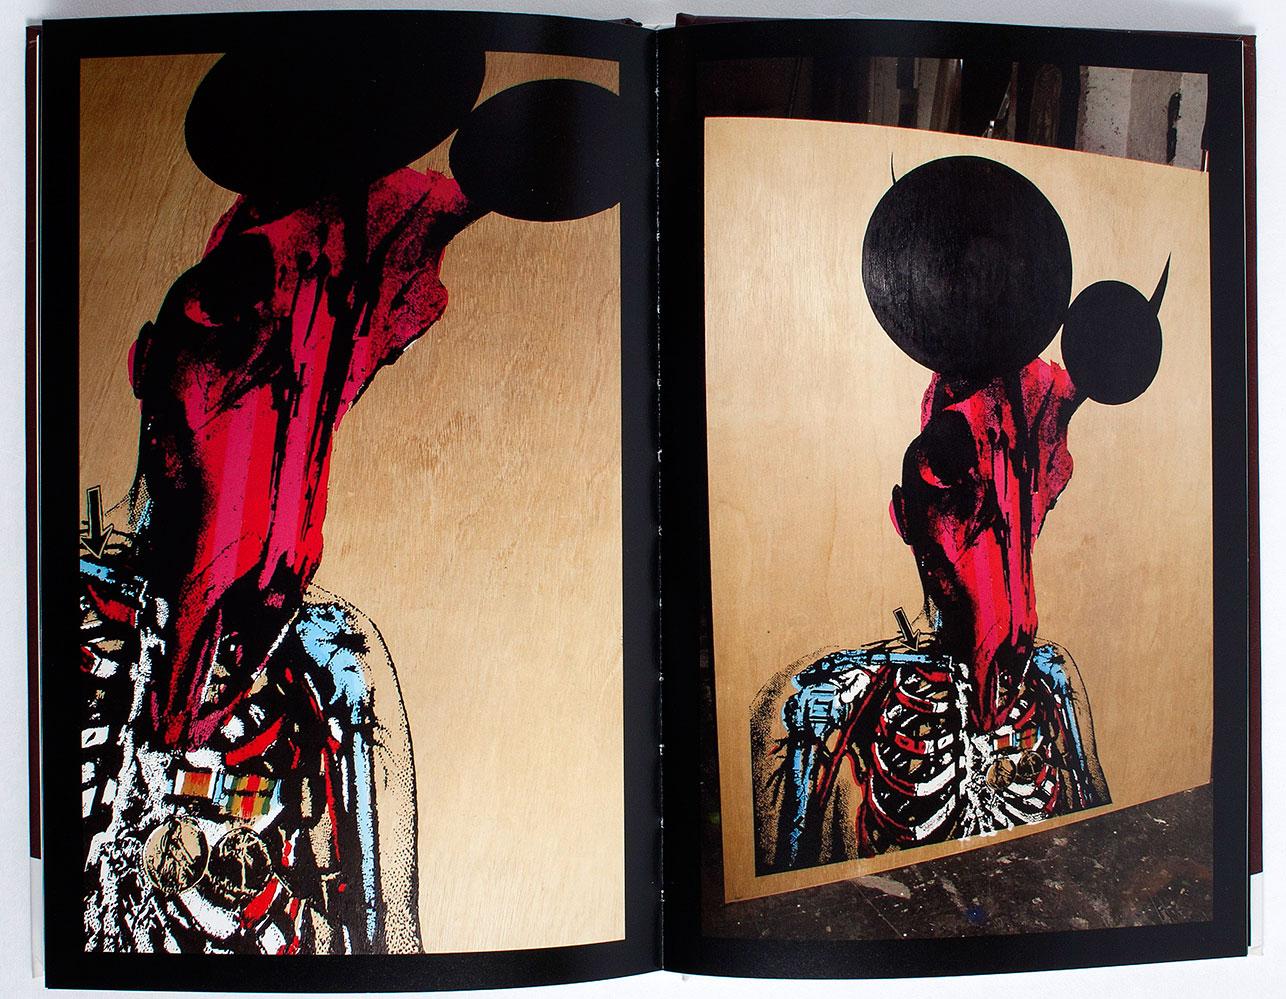 epm-print-management-bristol-art-books-paul-insect-4.jpg